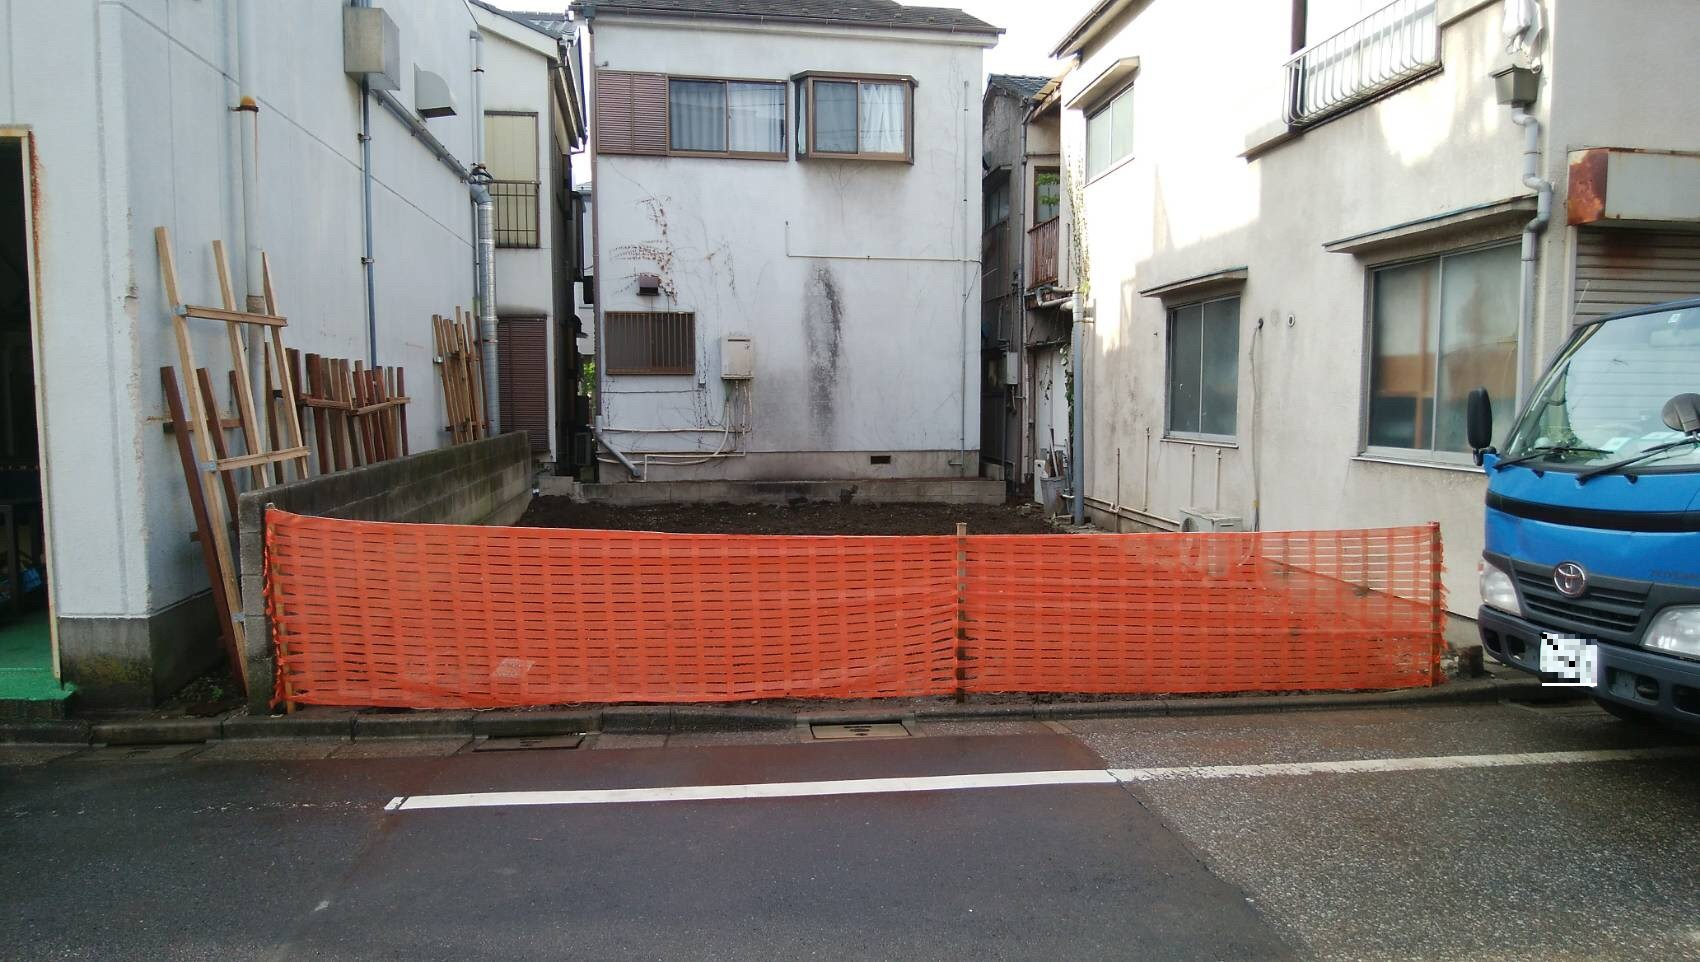 A image of 東京都足立区 解体工事 【東京・埼玉・神奈川の解体工事なら東央建設へ】